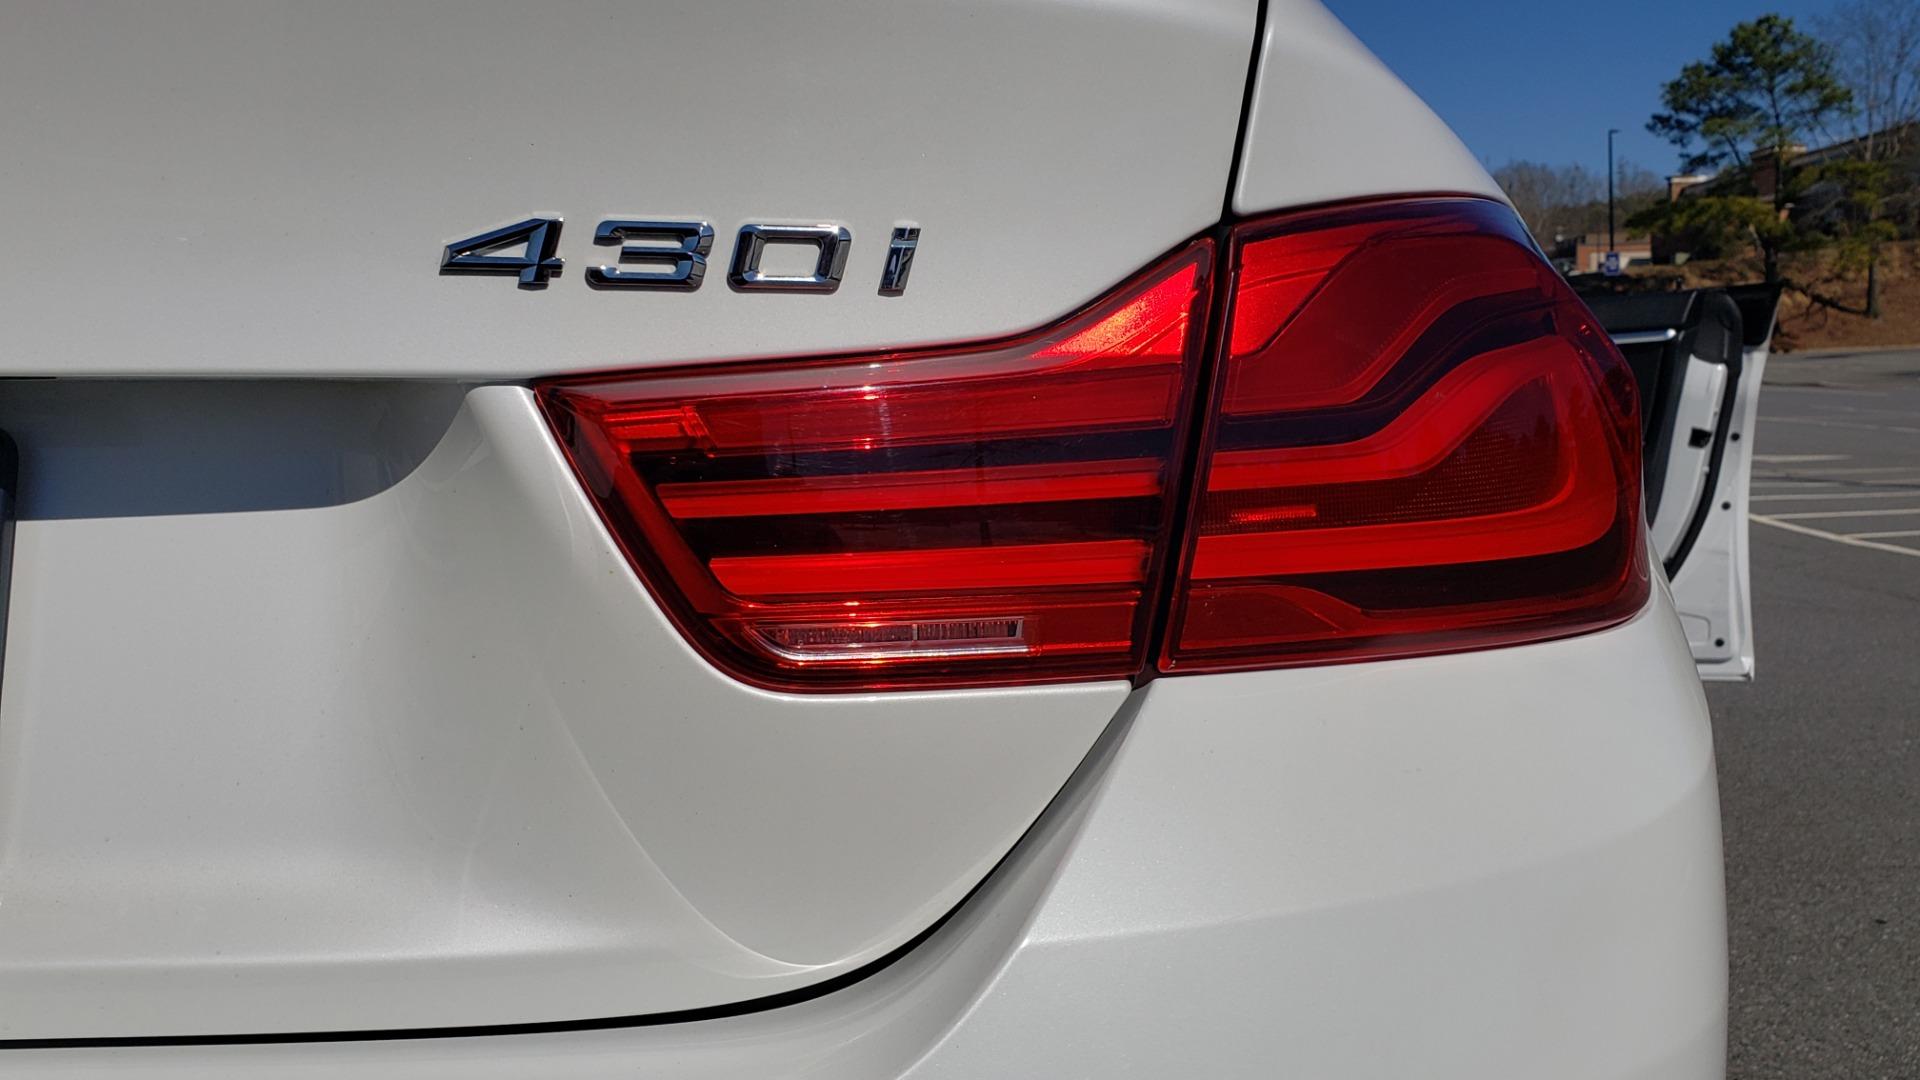 Used 2018 BMW 4 SERIES 430IXDRIVE / PREMIUM / NAV / SUNROOF / ESSENTIALS PKG for sale $28,995 at Formula Imports in Charlotte NC 28227 23